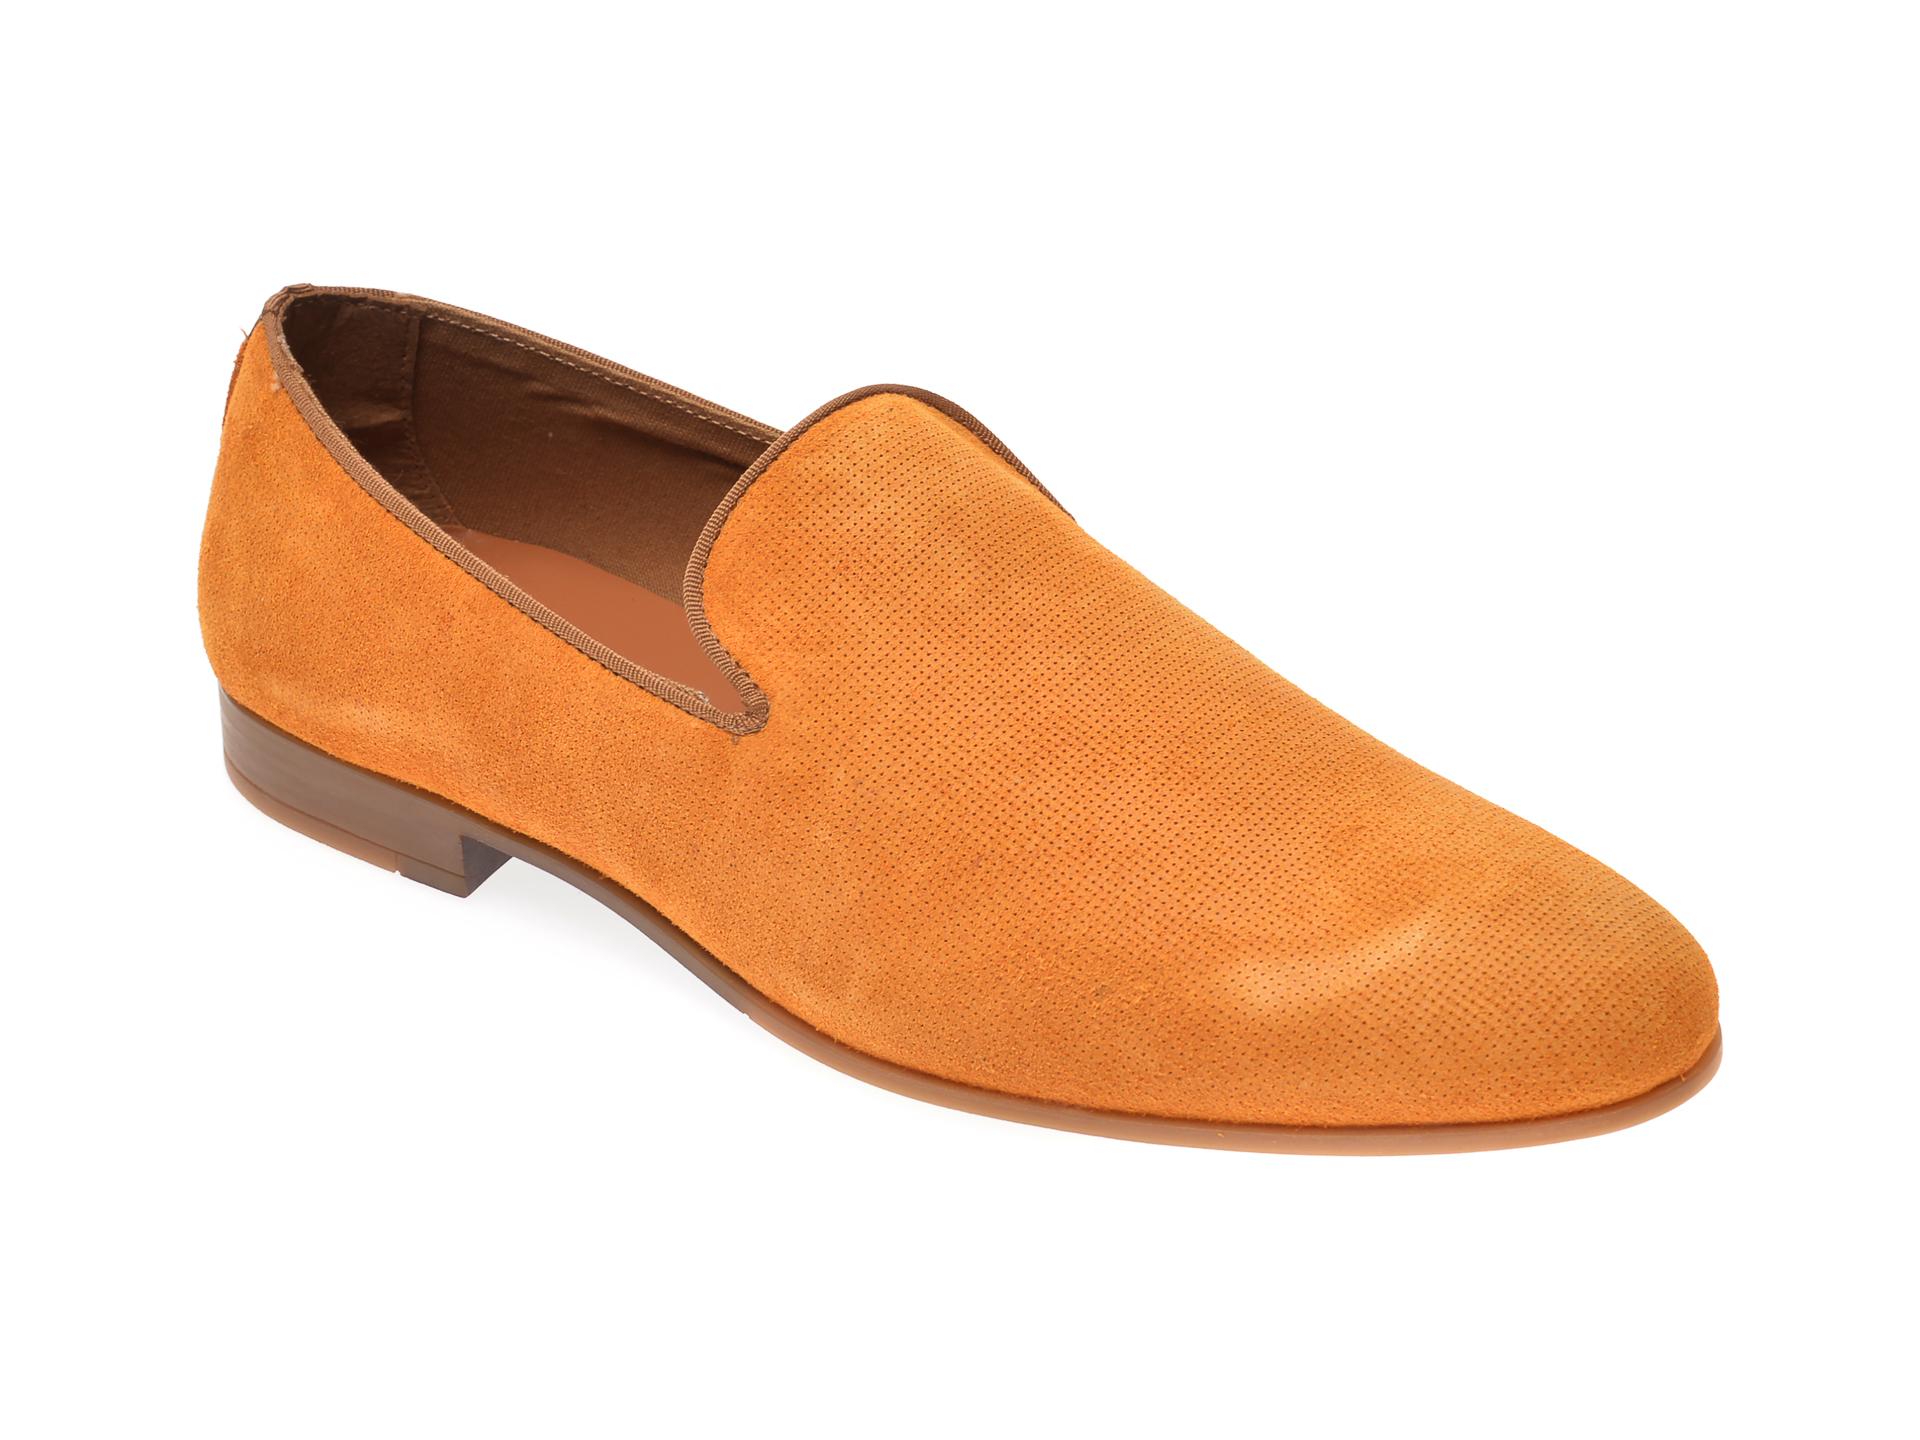 Pantofi ALDO galbeni, Tralisien701, din piele intoarsa imagine